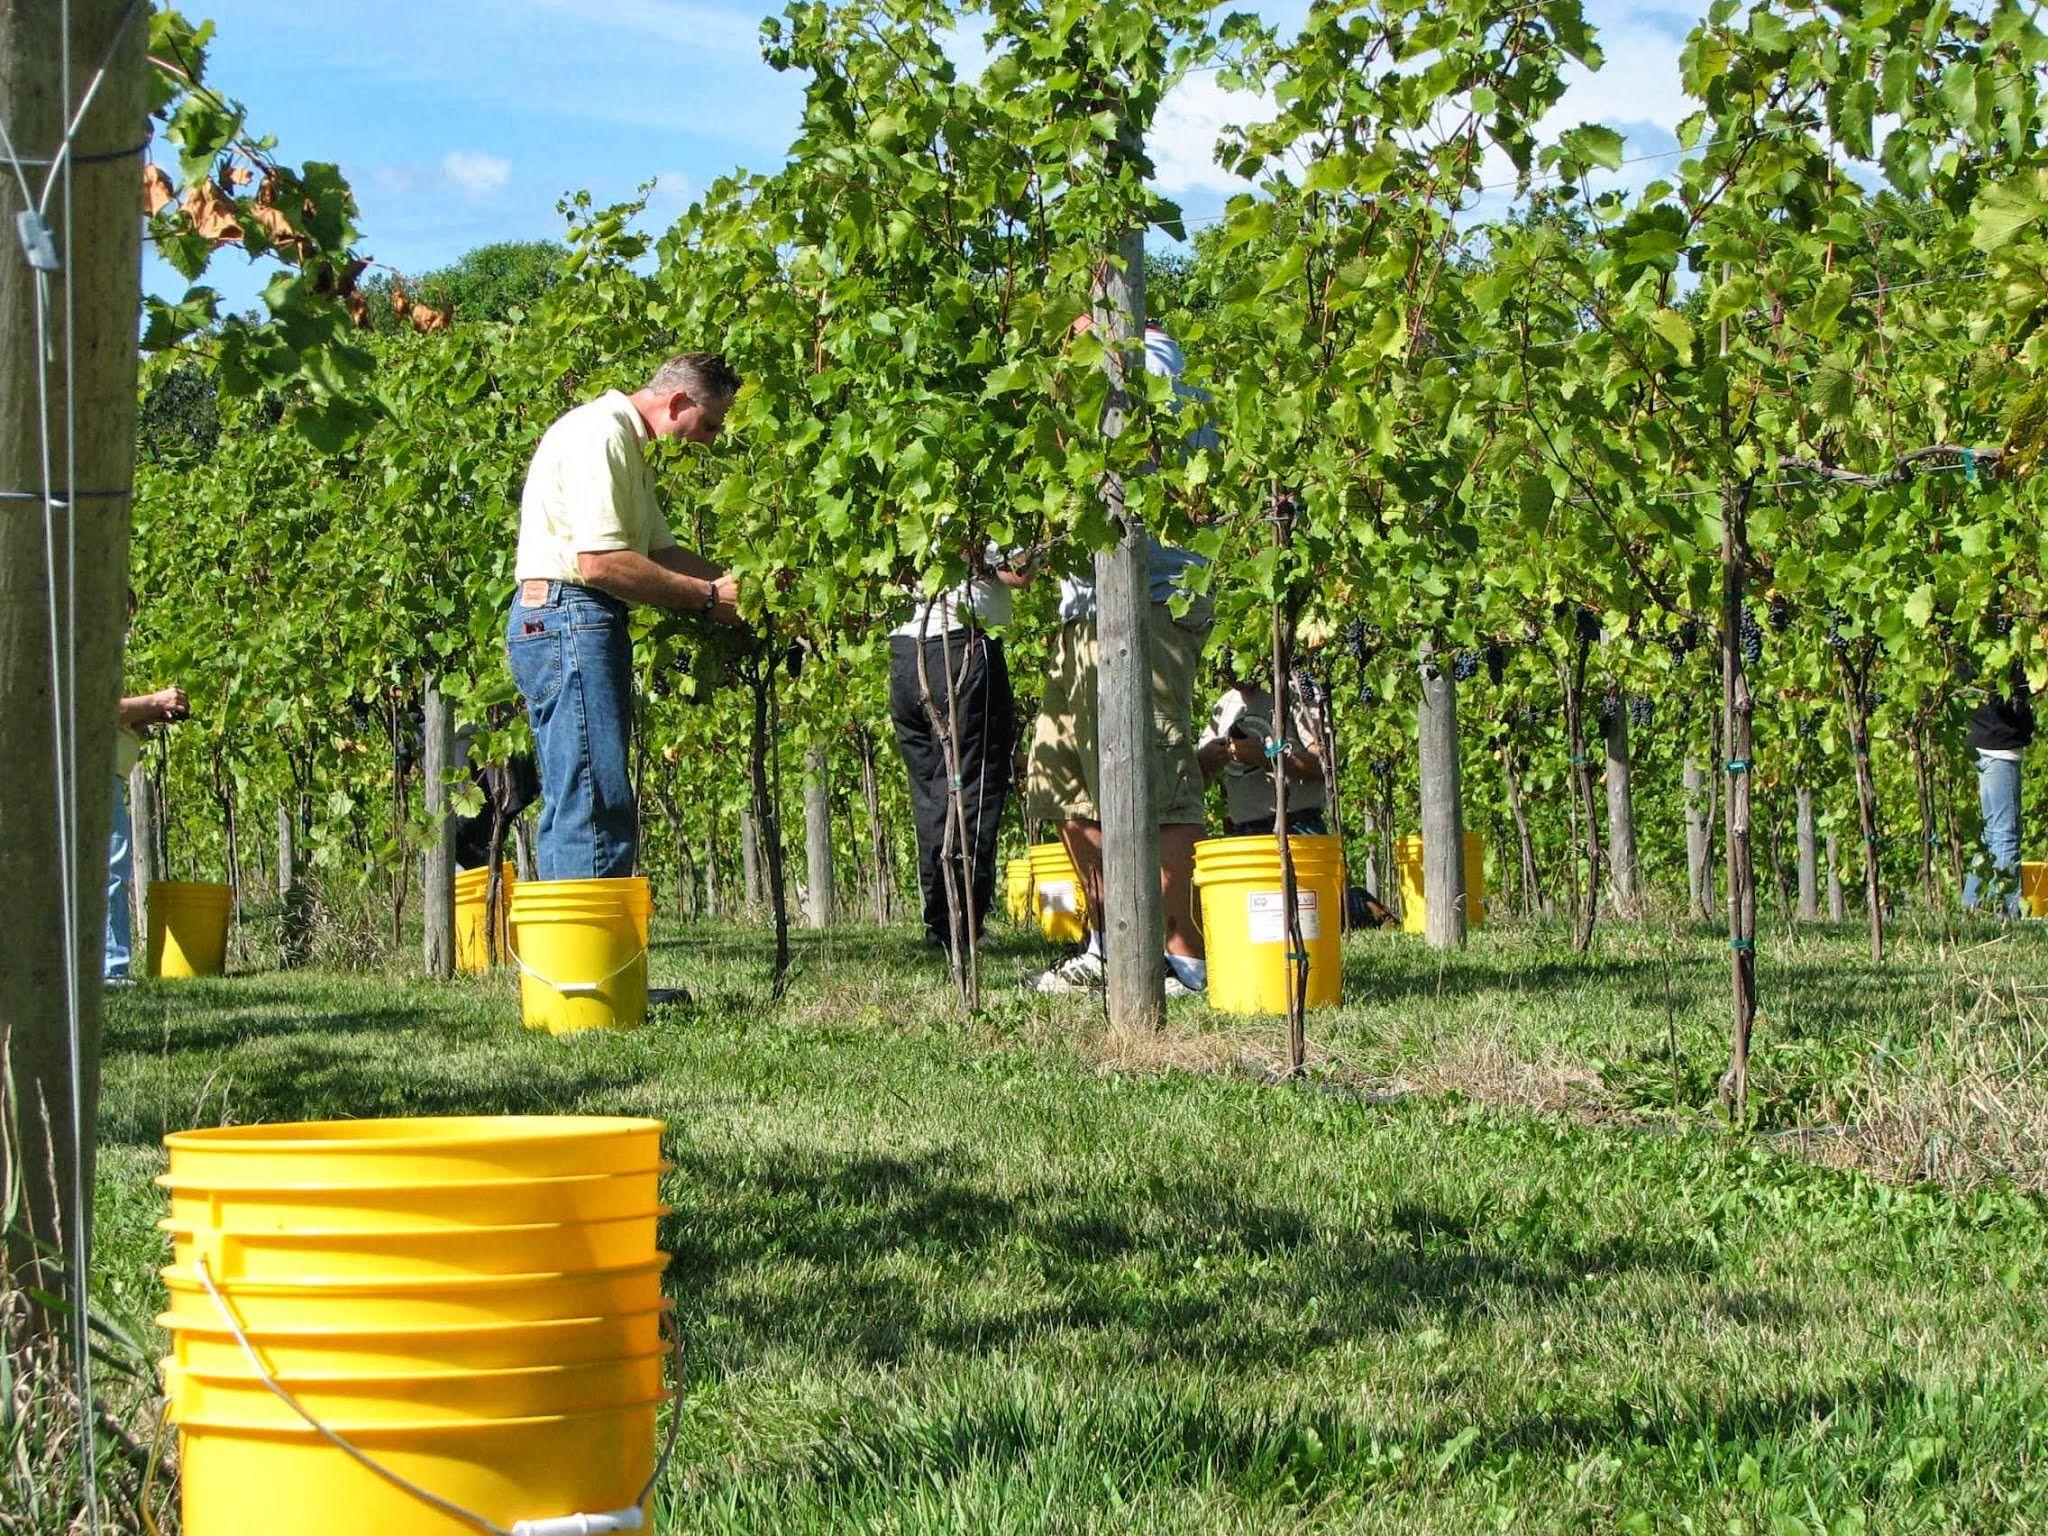 Whispering Oaks Winery >> Whispering Oaks Winery In Melrose Mn Www Minnesotawinepassport